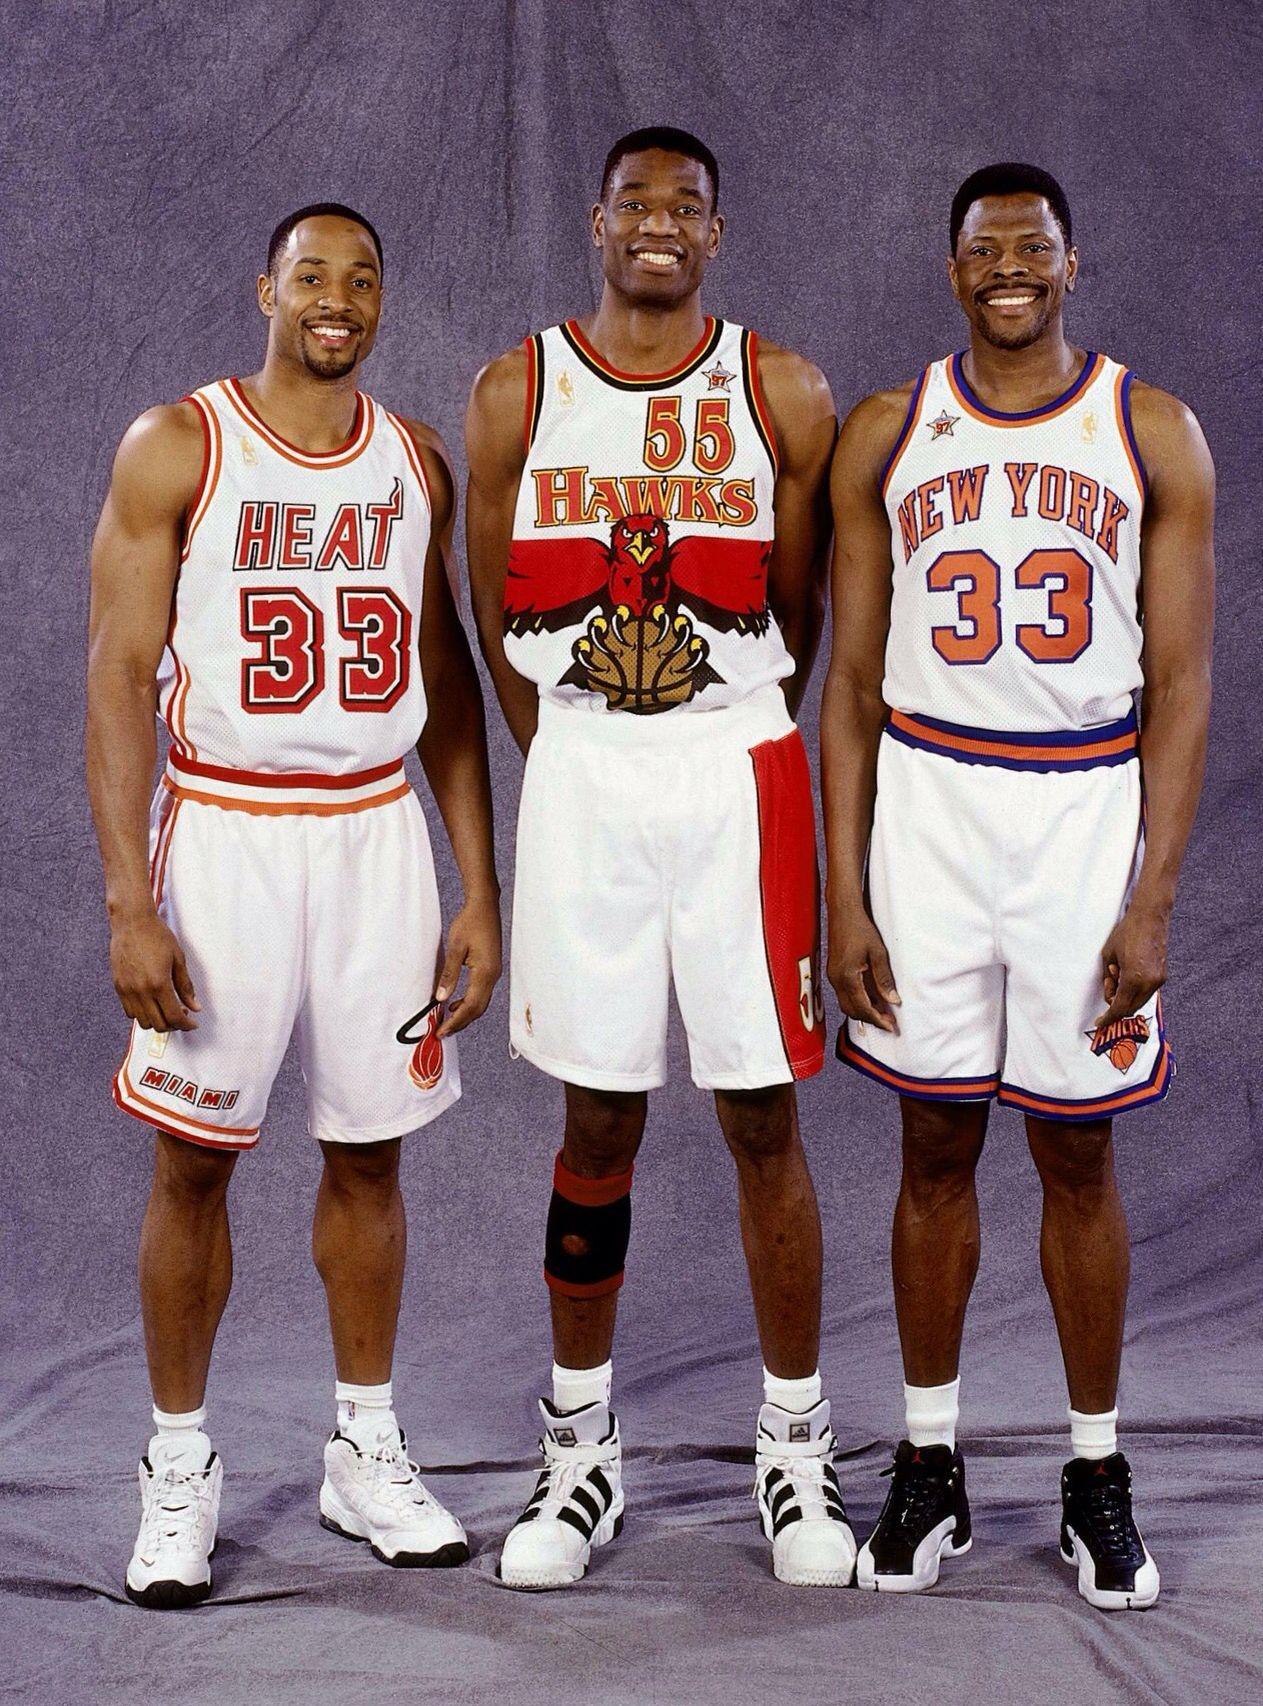 newest 1c546 32b2e Georgetown Centers: Alonzo Mourning, Dikembe Mutombo and ...